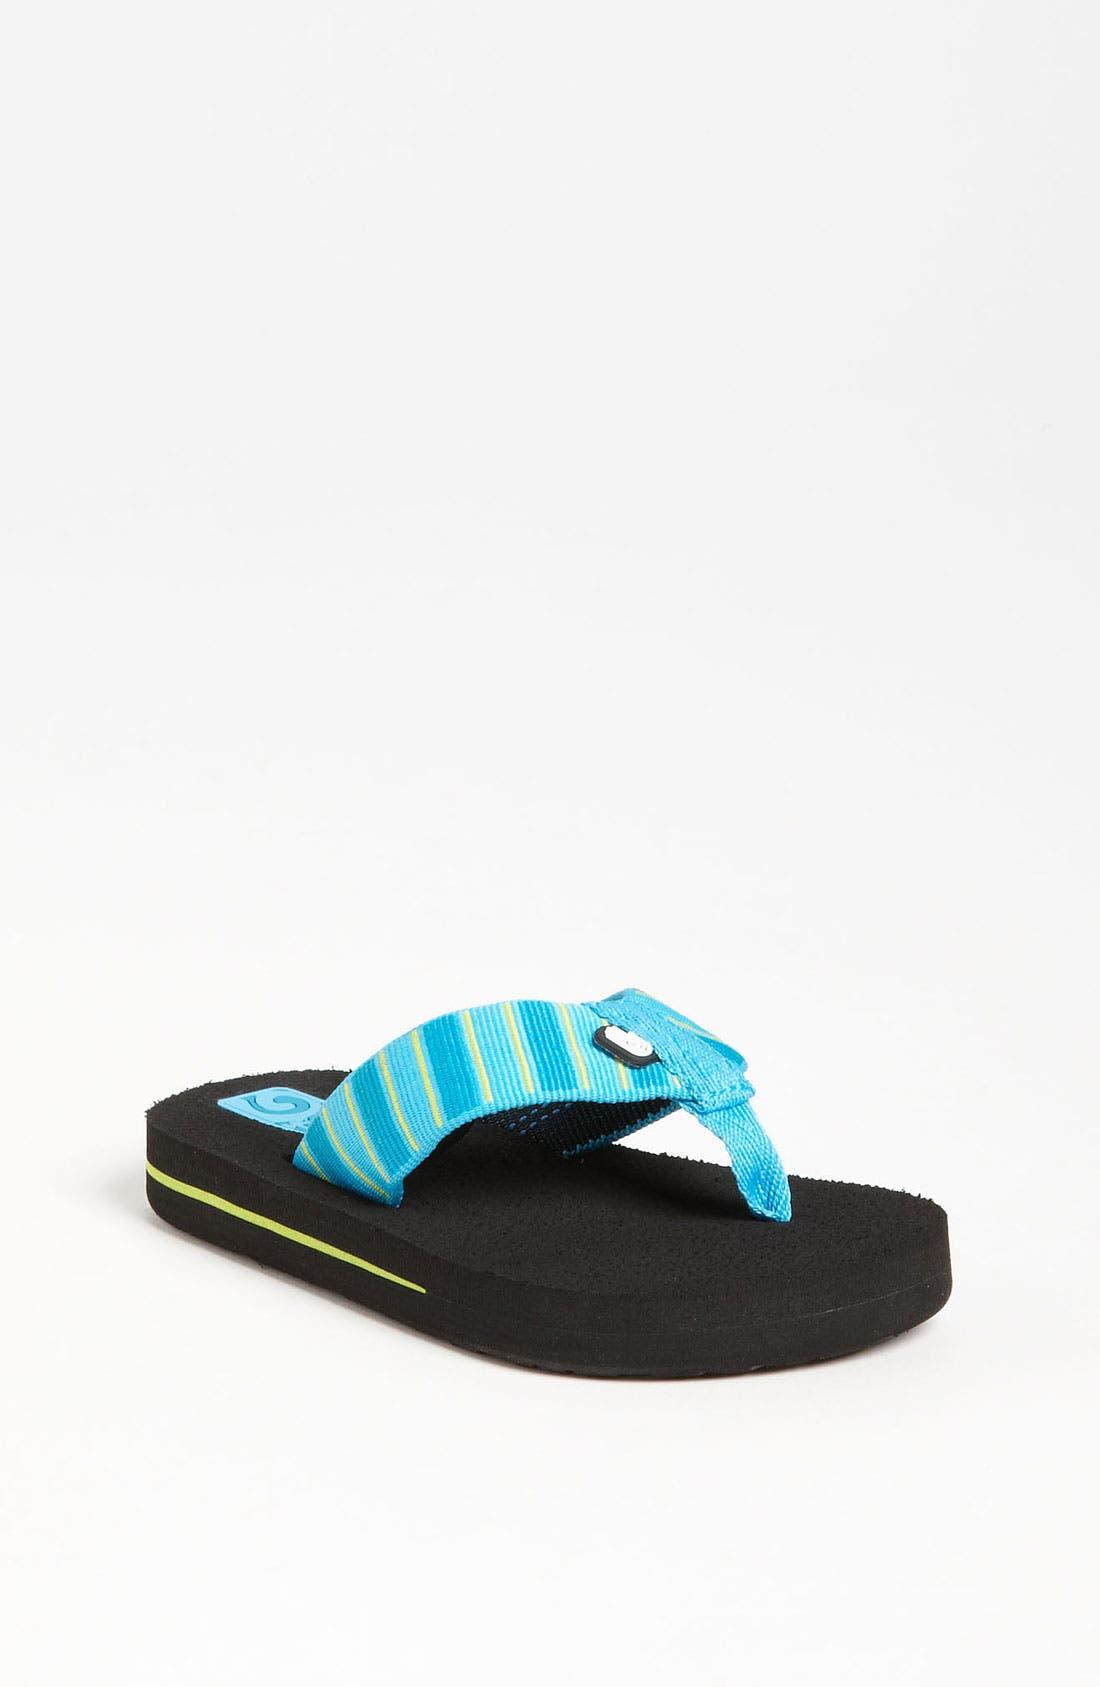 Main Image - Teva 'Mush' Sandal (Toddler, Little Kid & Big Kid)